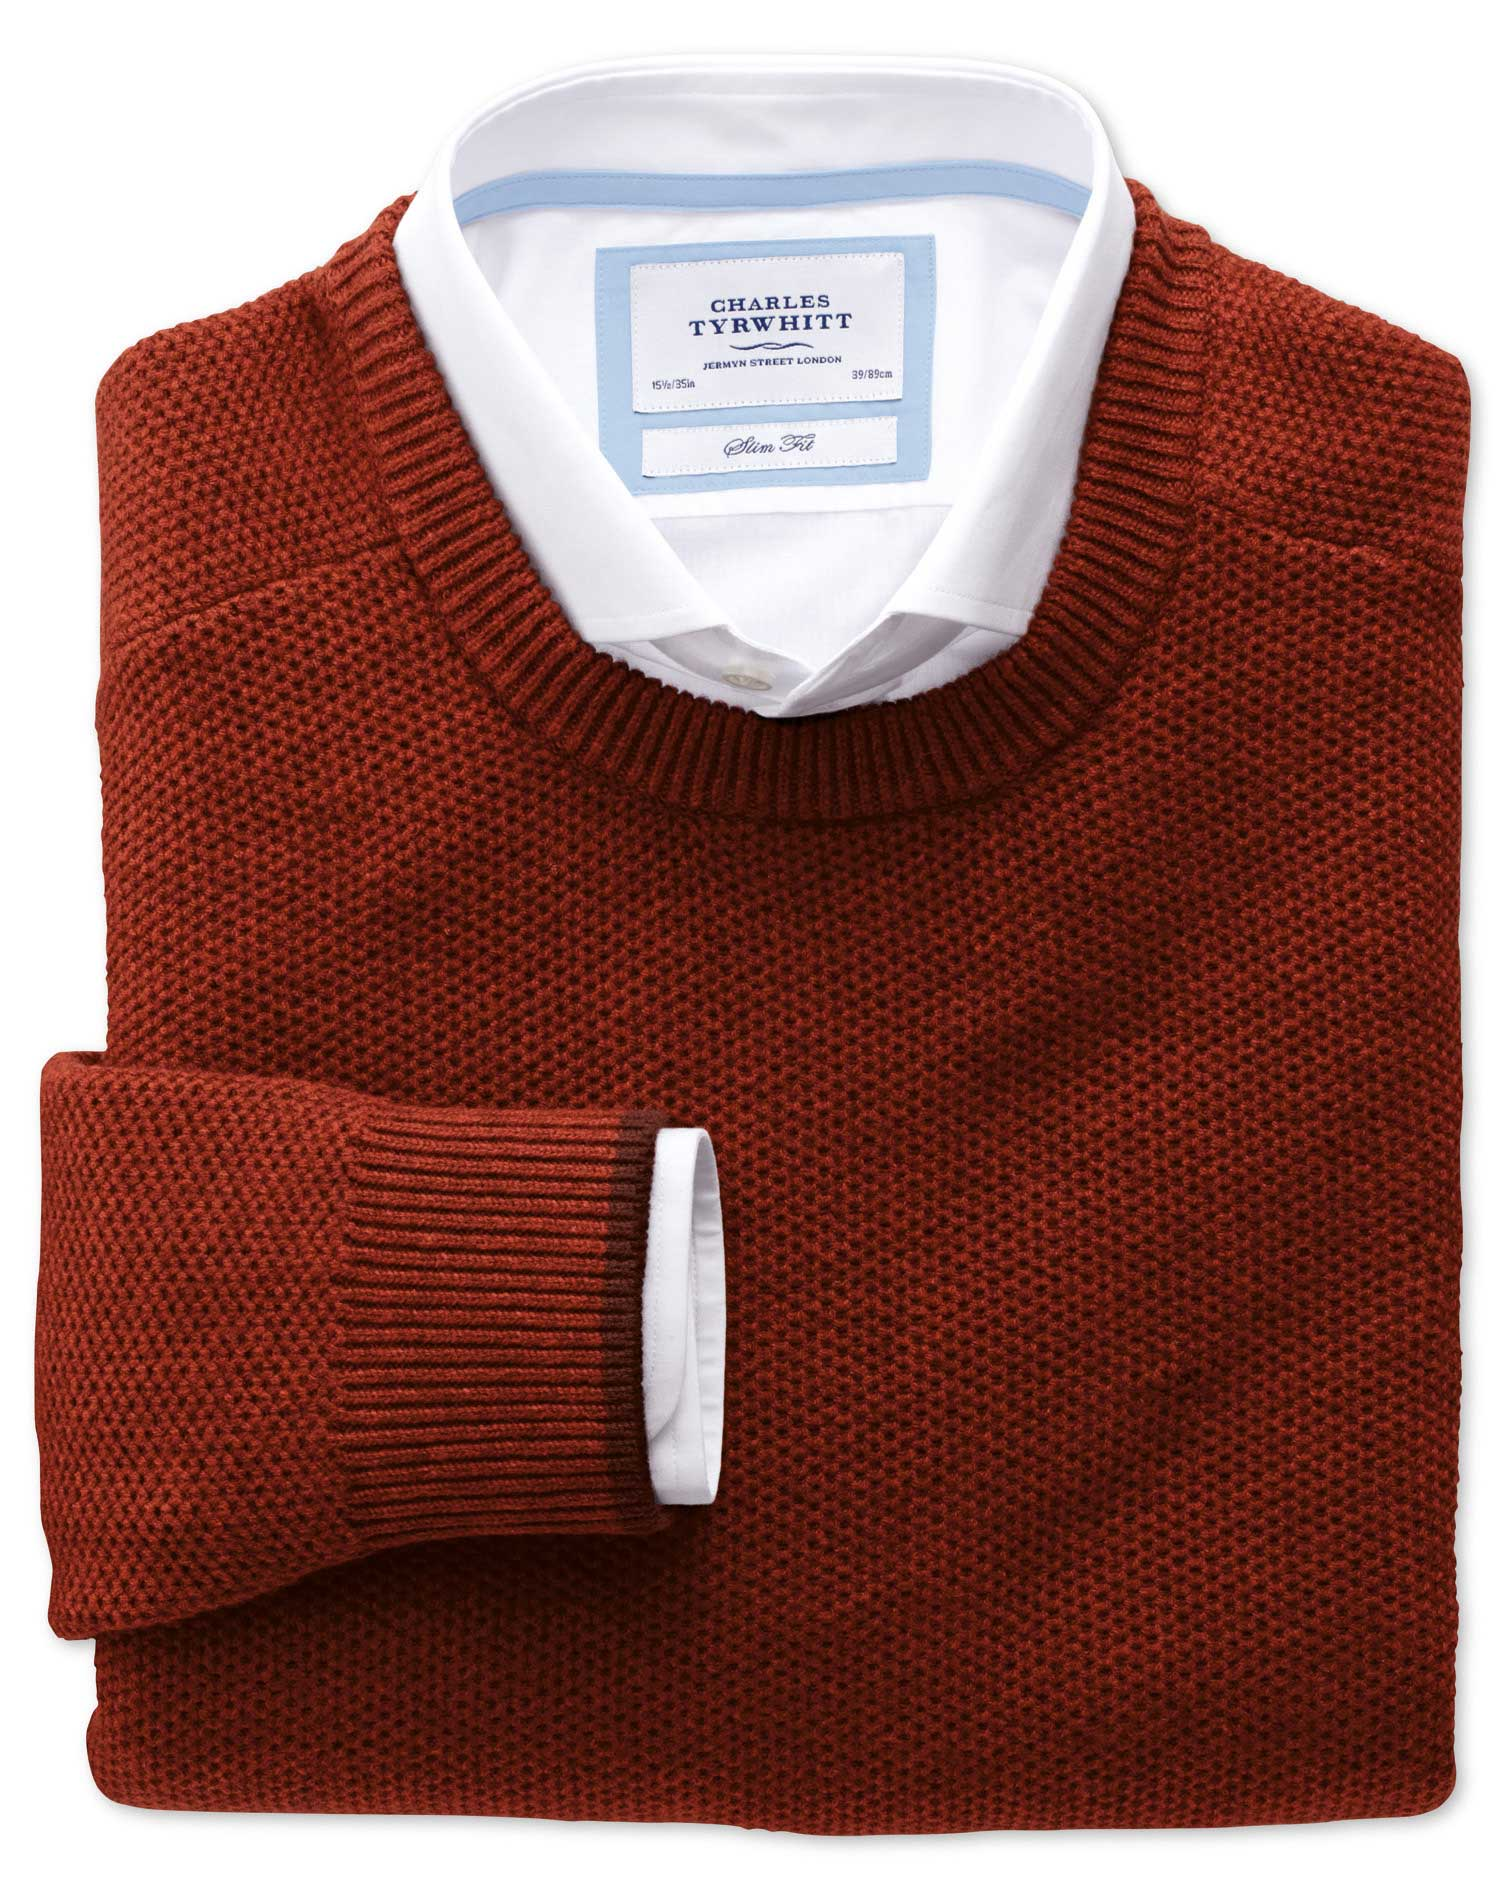 Copper Merino Cotton Crew Neck Wool Jumper Size XXL by Charles Tyrwhitt